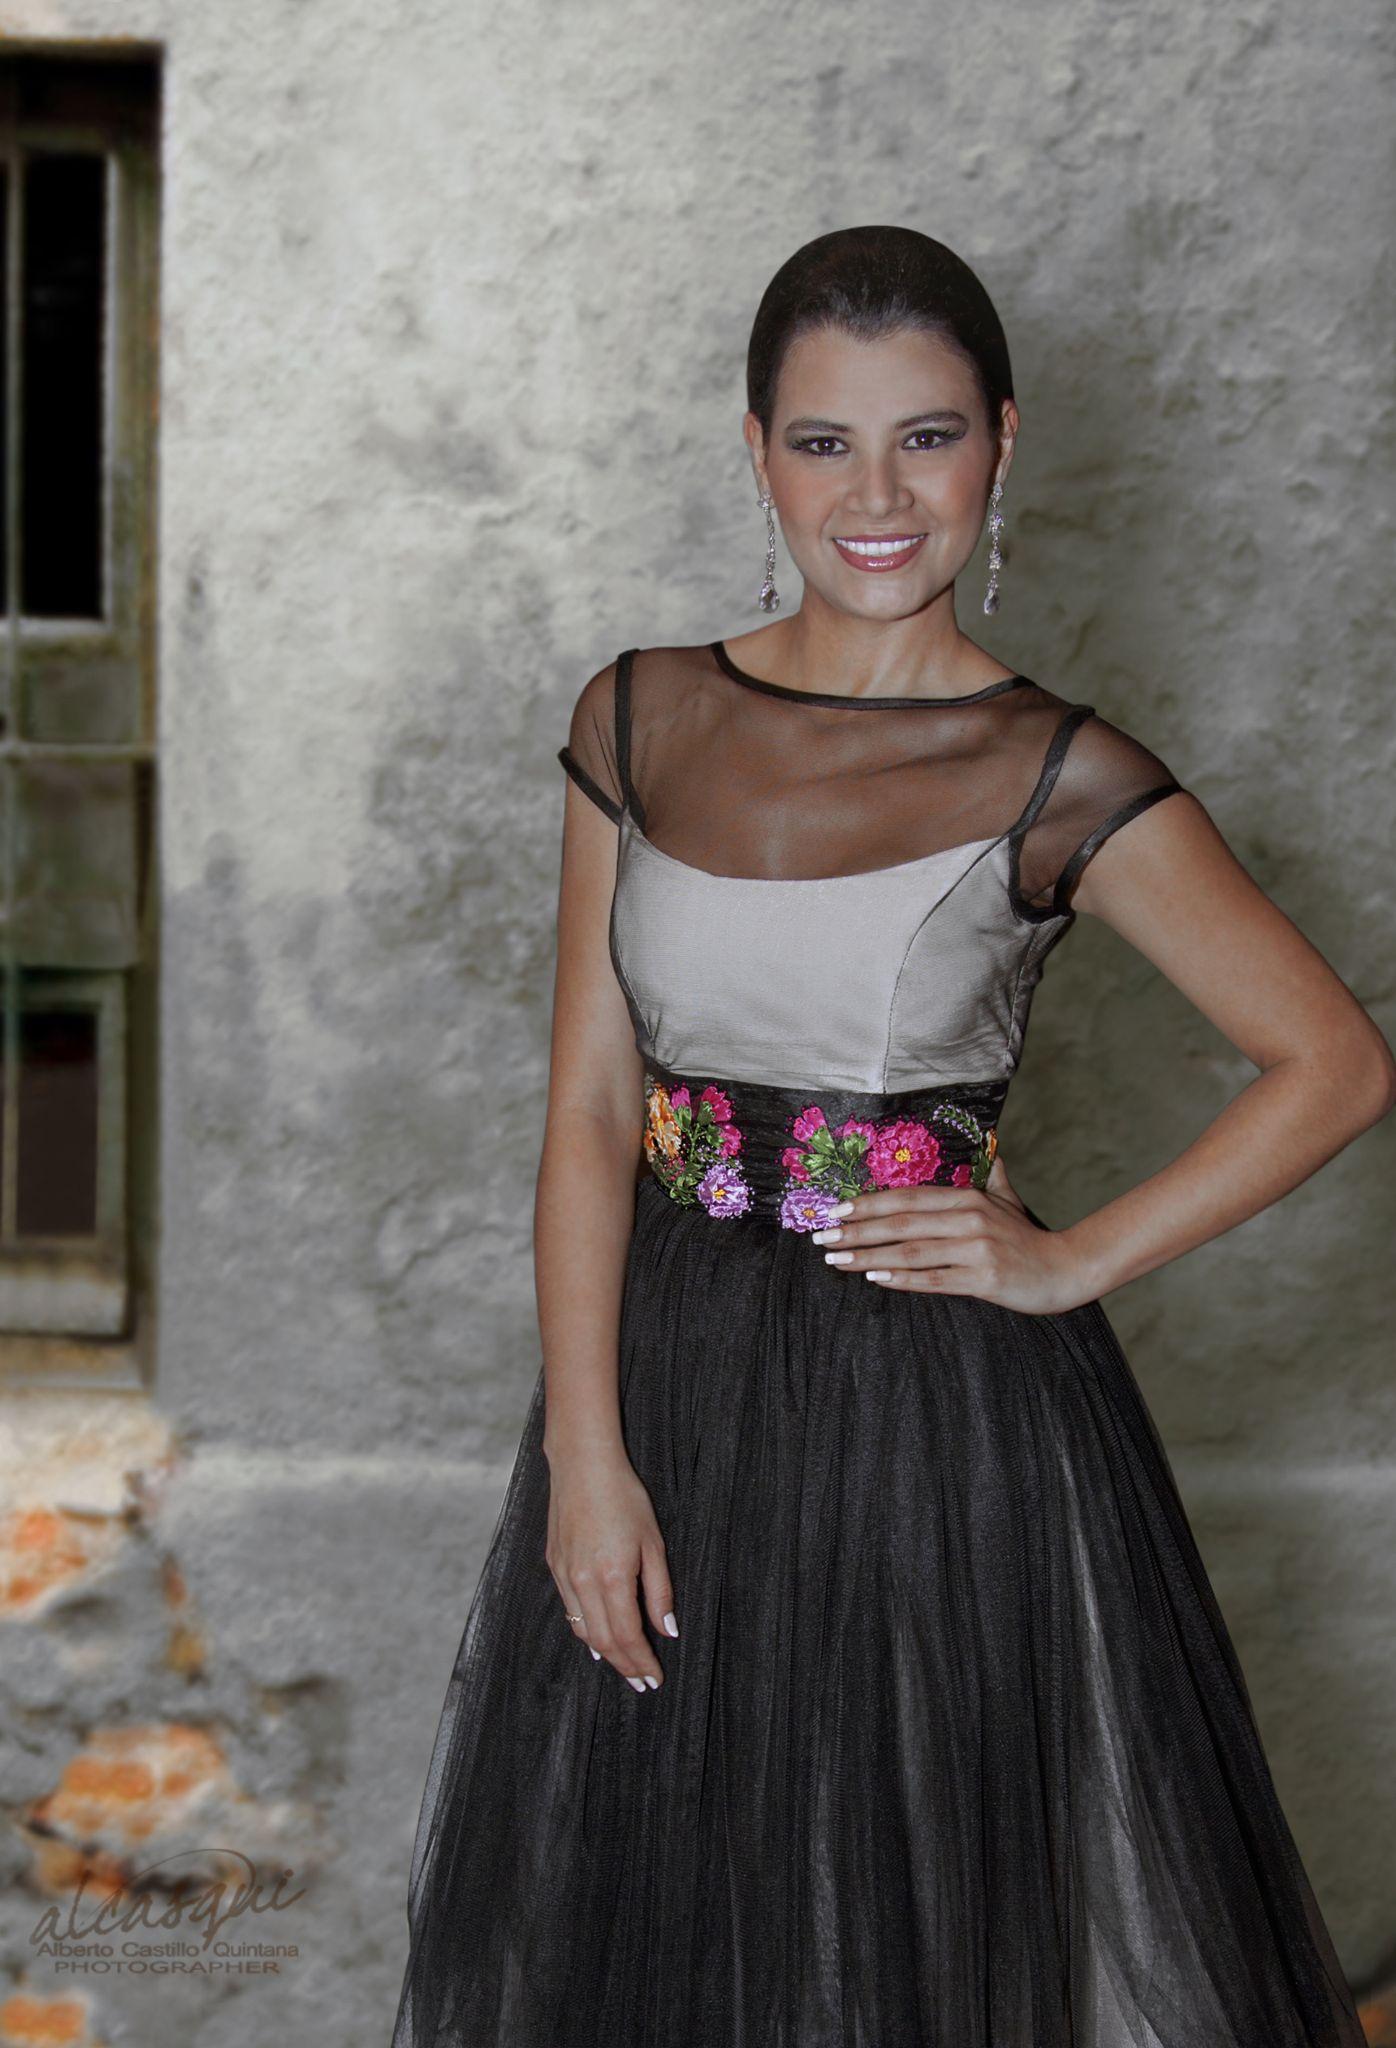 Moda by Alcasqui